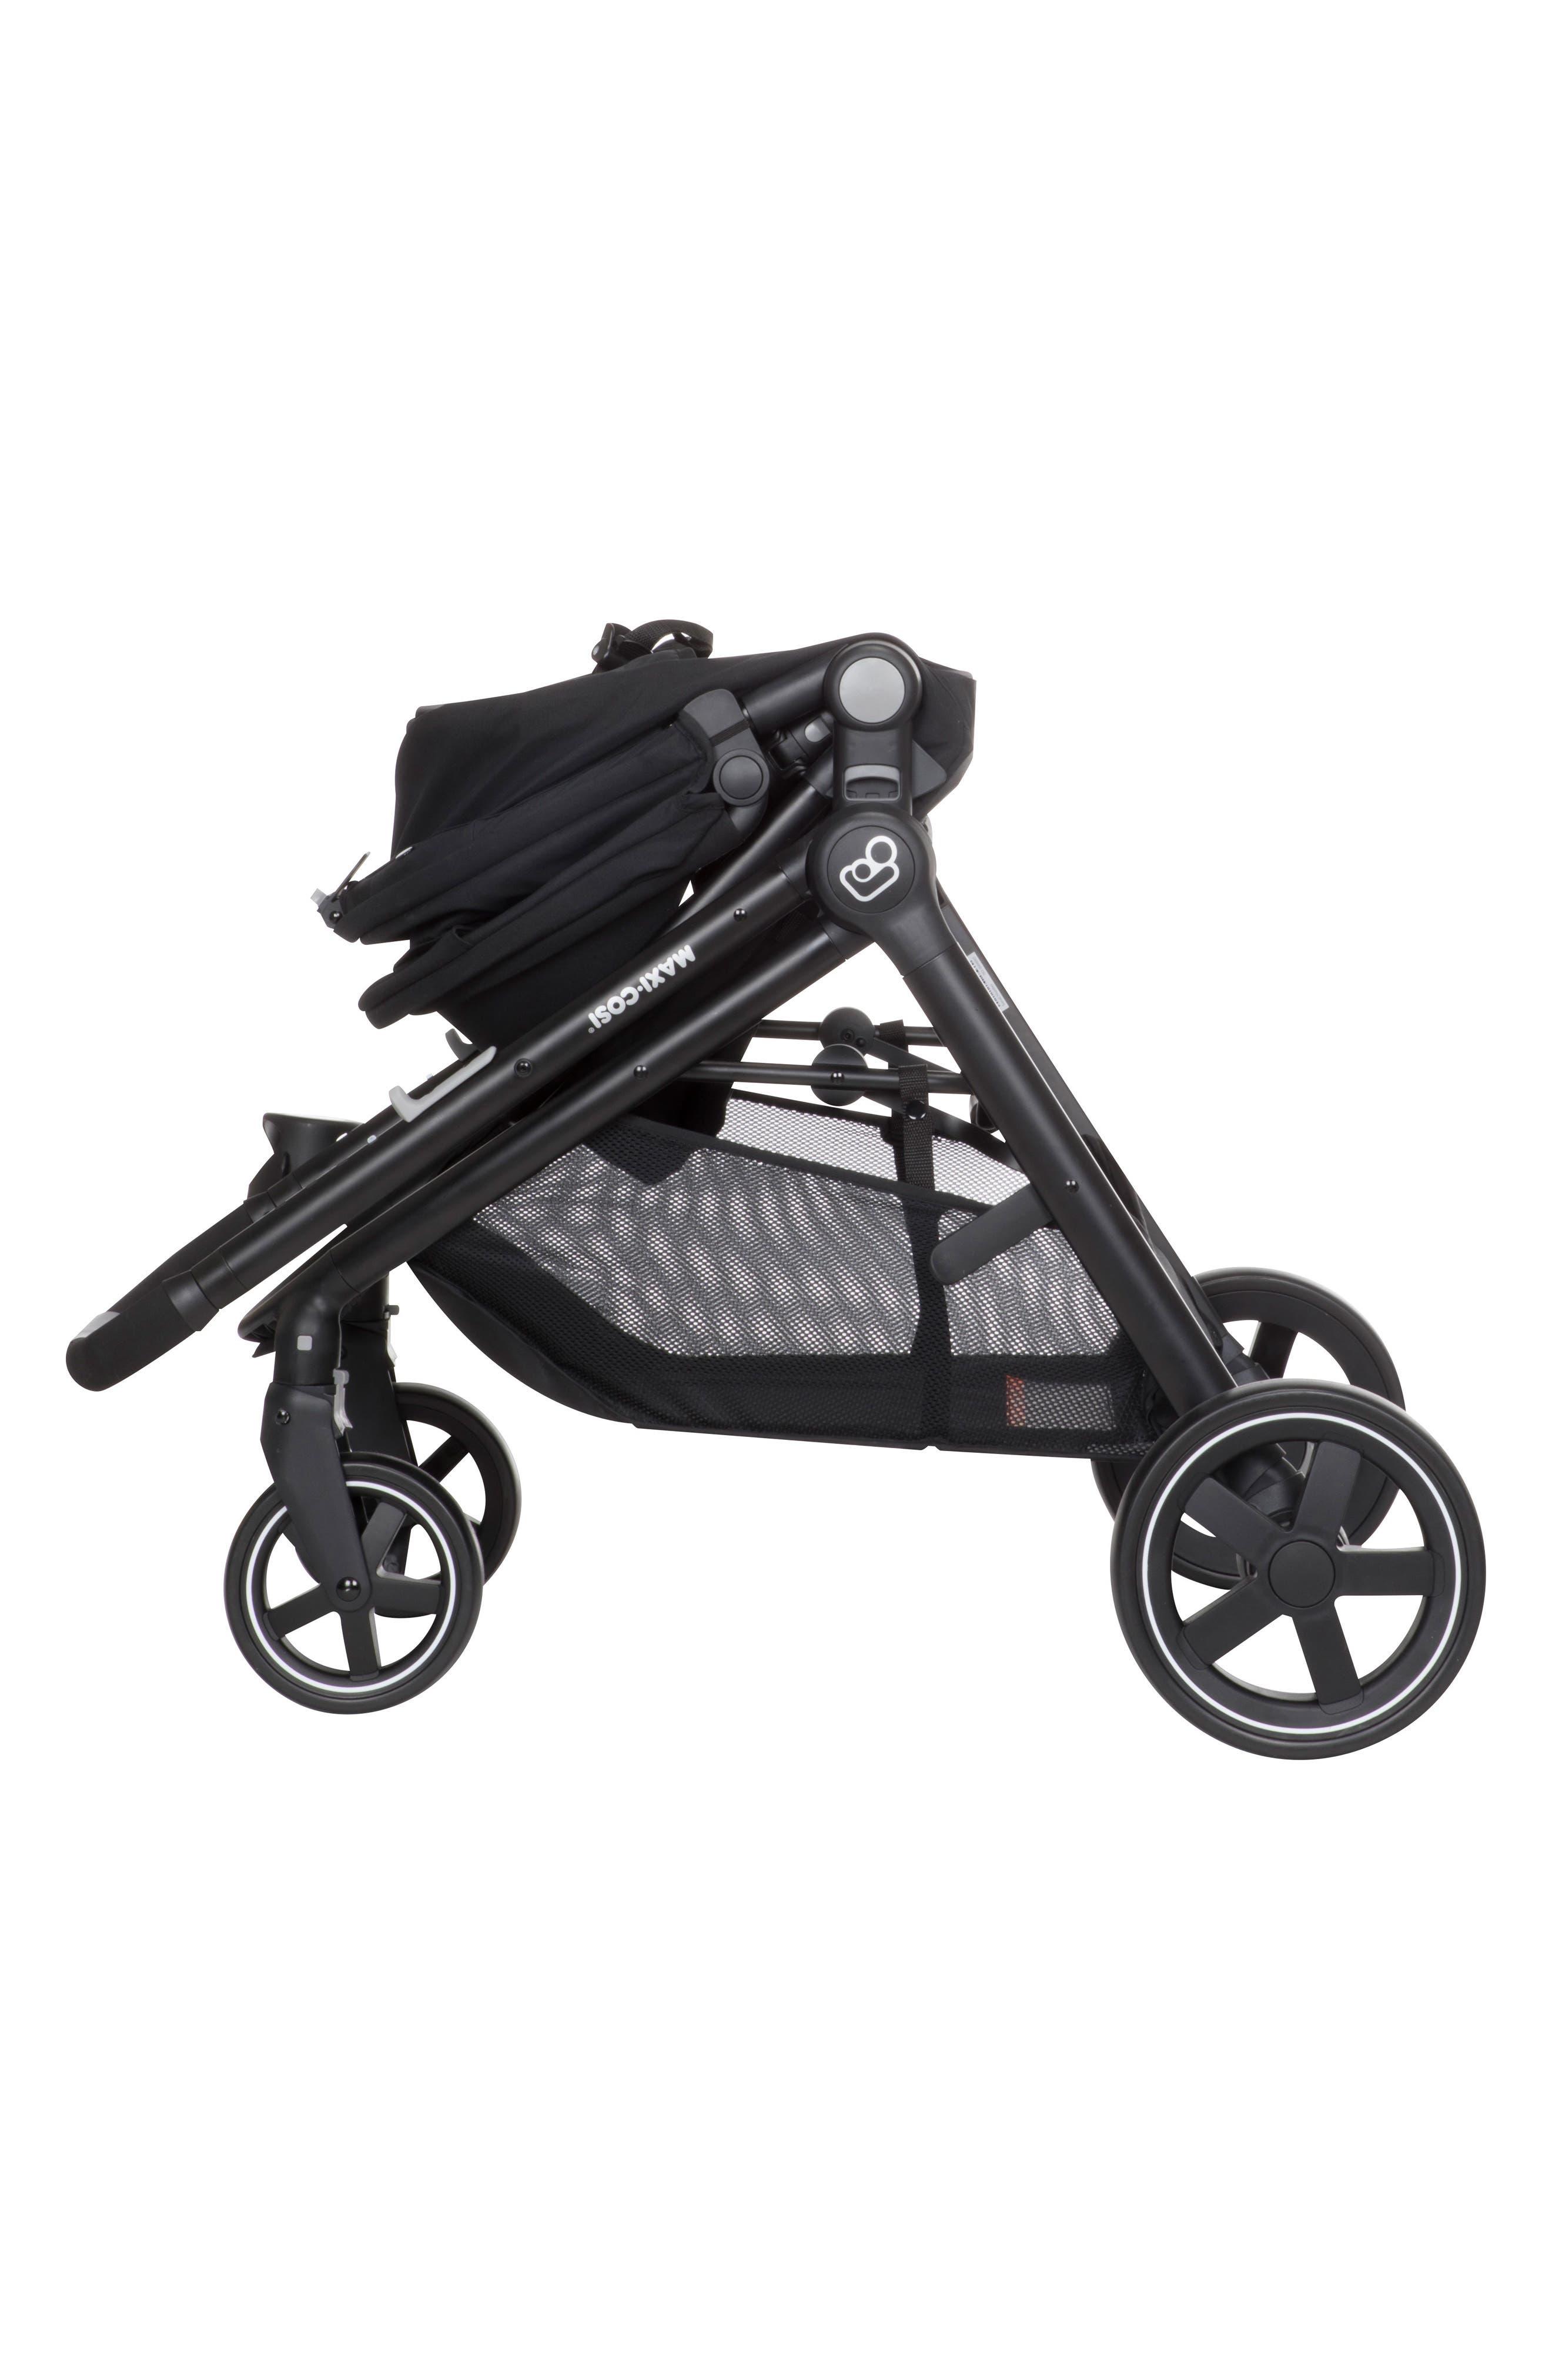 5-1 Mico 30 Infant Car Seat & Zelia Stroller Modular Travel System,                             Alternate thumbnail 9, color,                             NIGHT BLACK